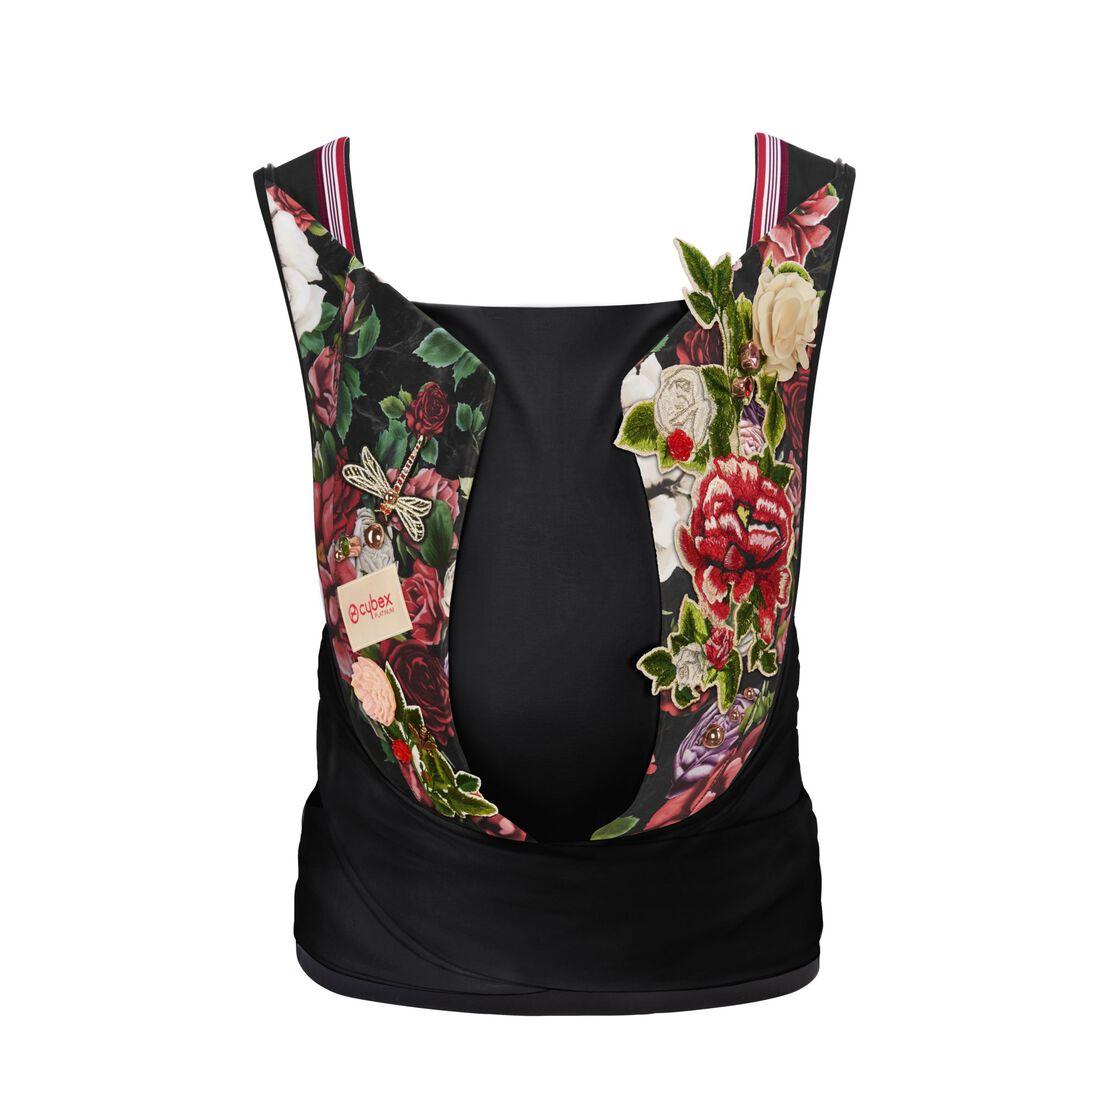 CYBEX Yema Tie - Spring Blossom Dark in Spring Blossom Dark large image number 1